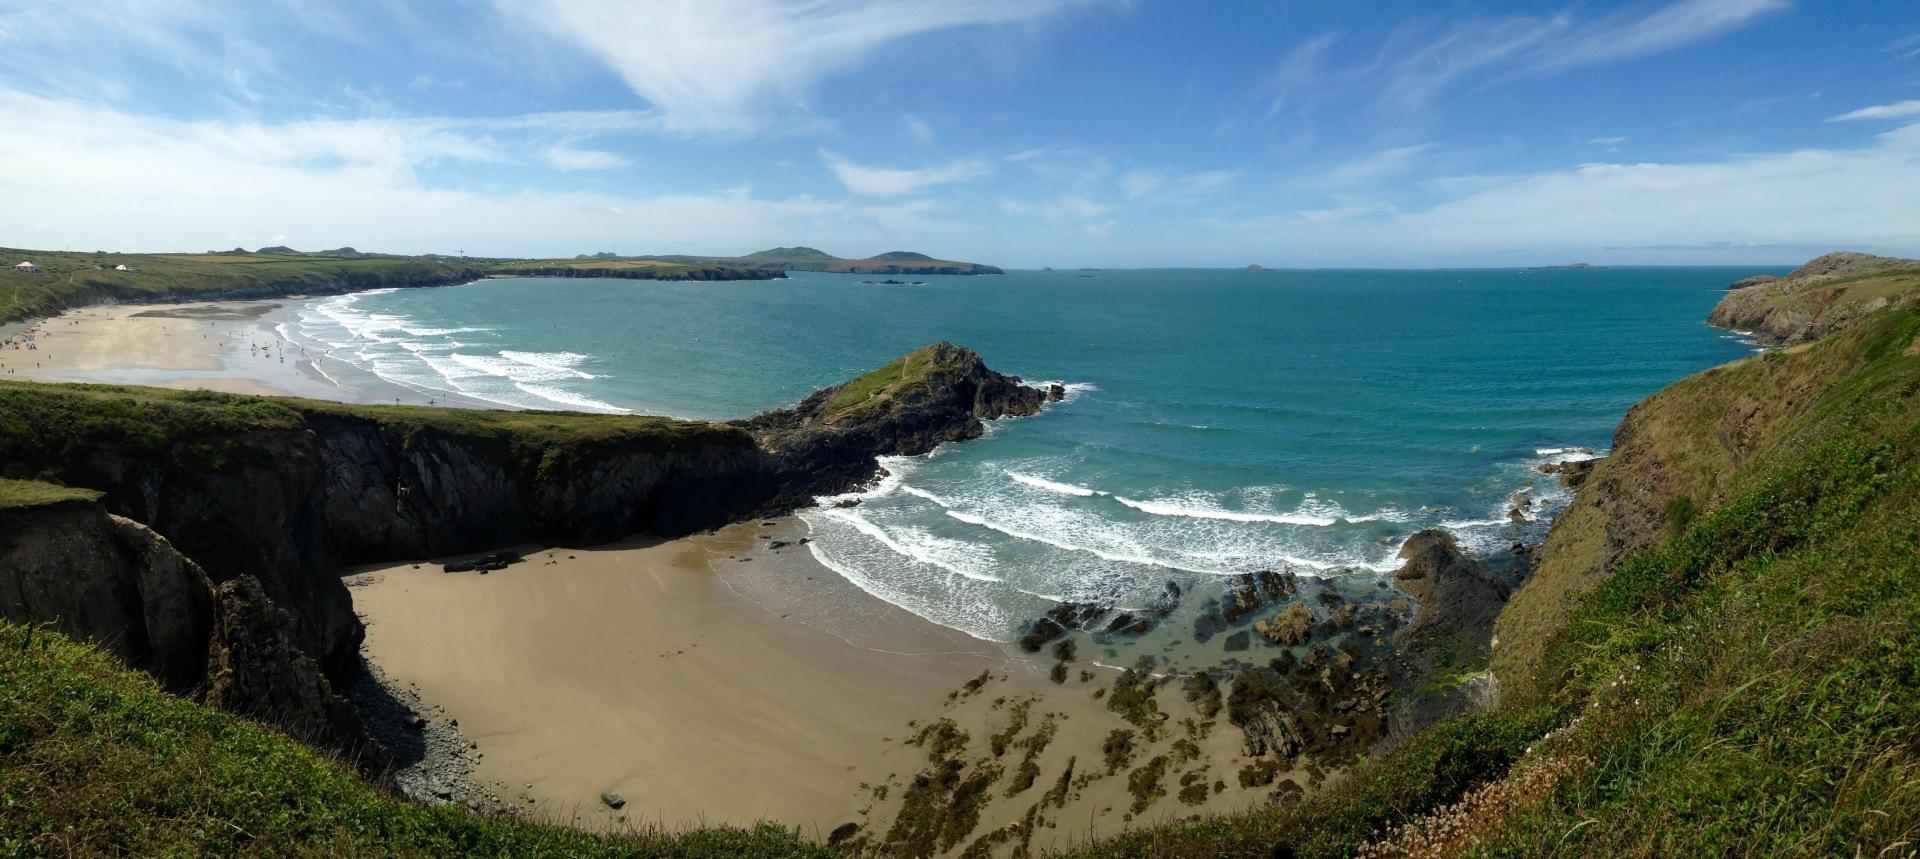 Whitesands Bay, Wales,